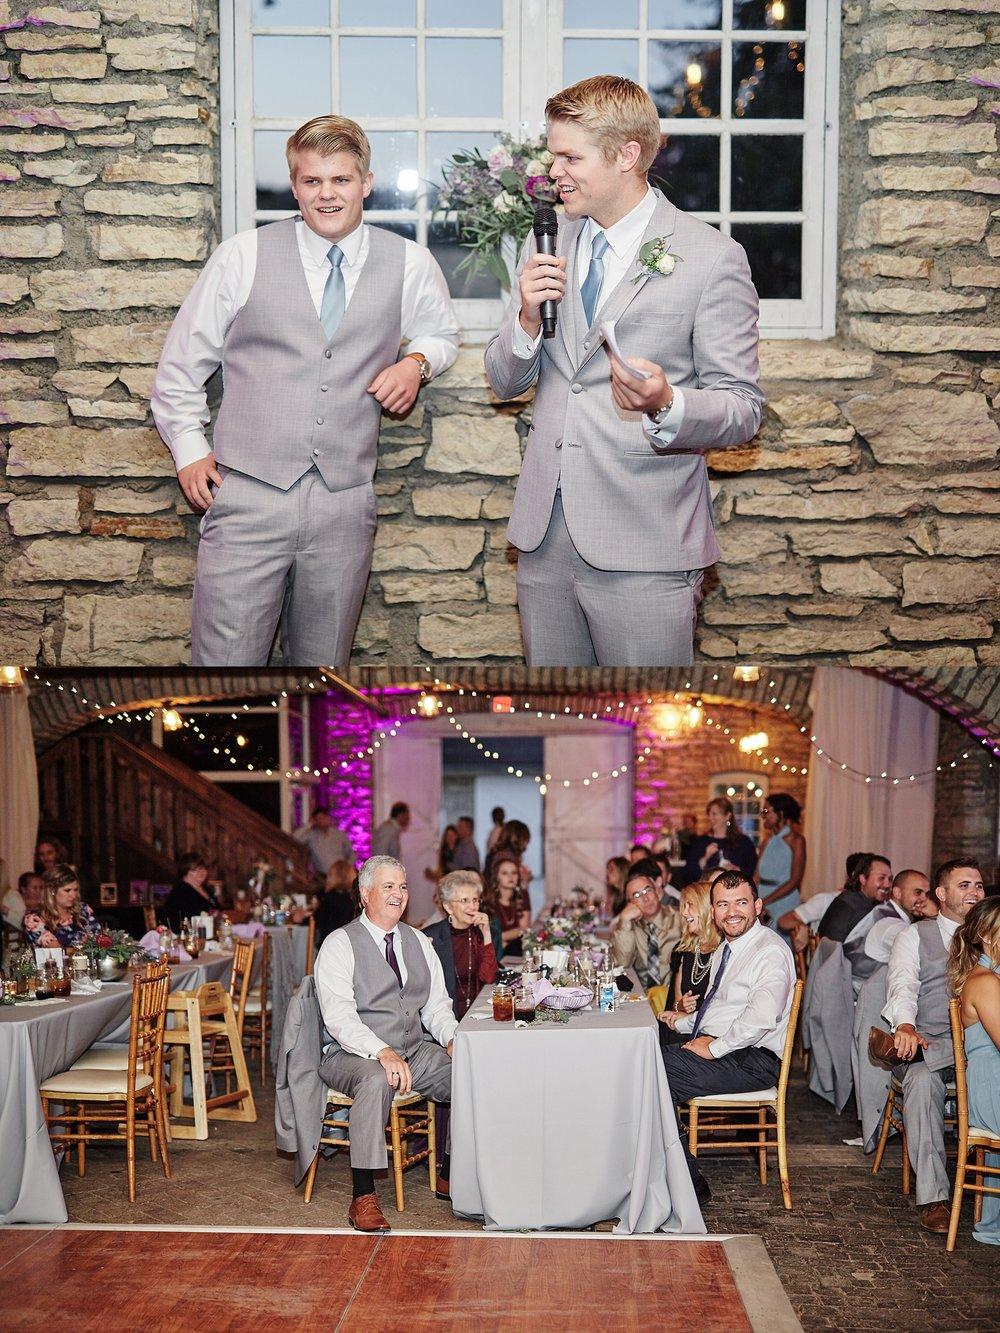 Maywood-Stone-Barn-Wedding-Rochester-Minnesota-Perry-James-Photo_0683.jpg